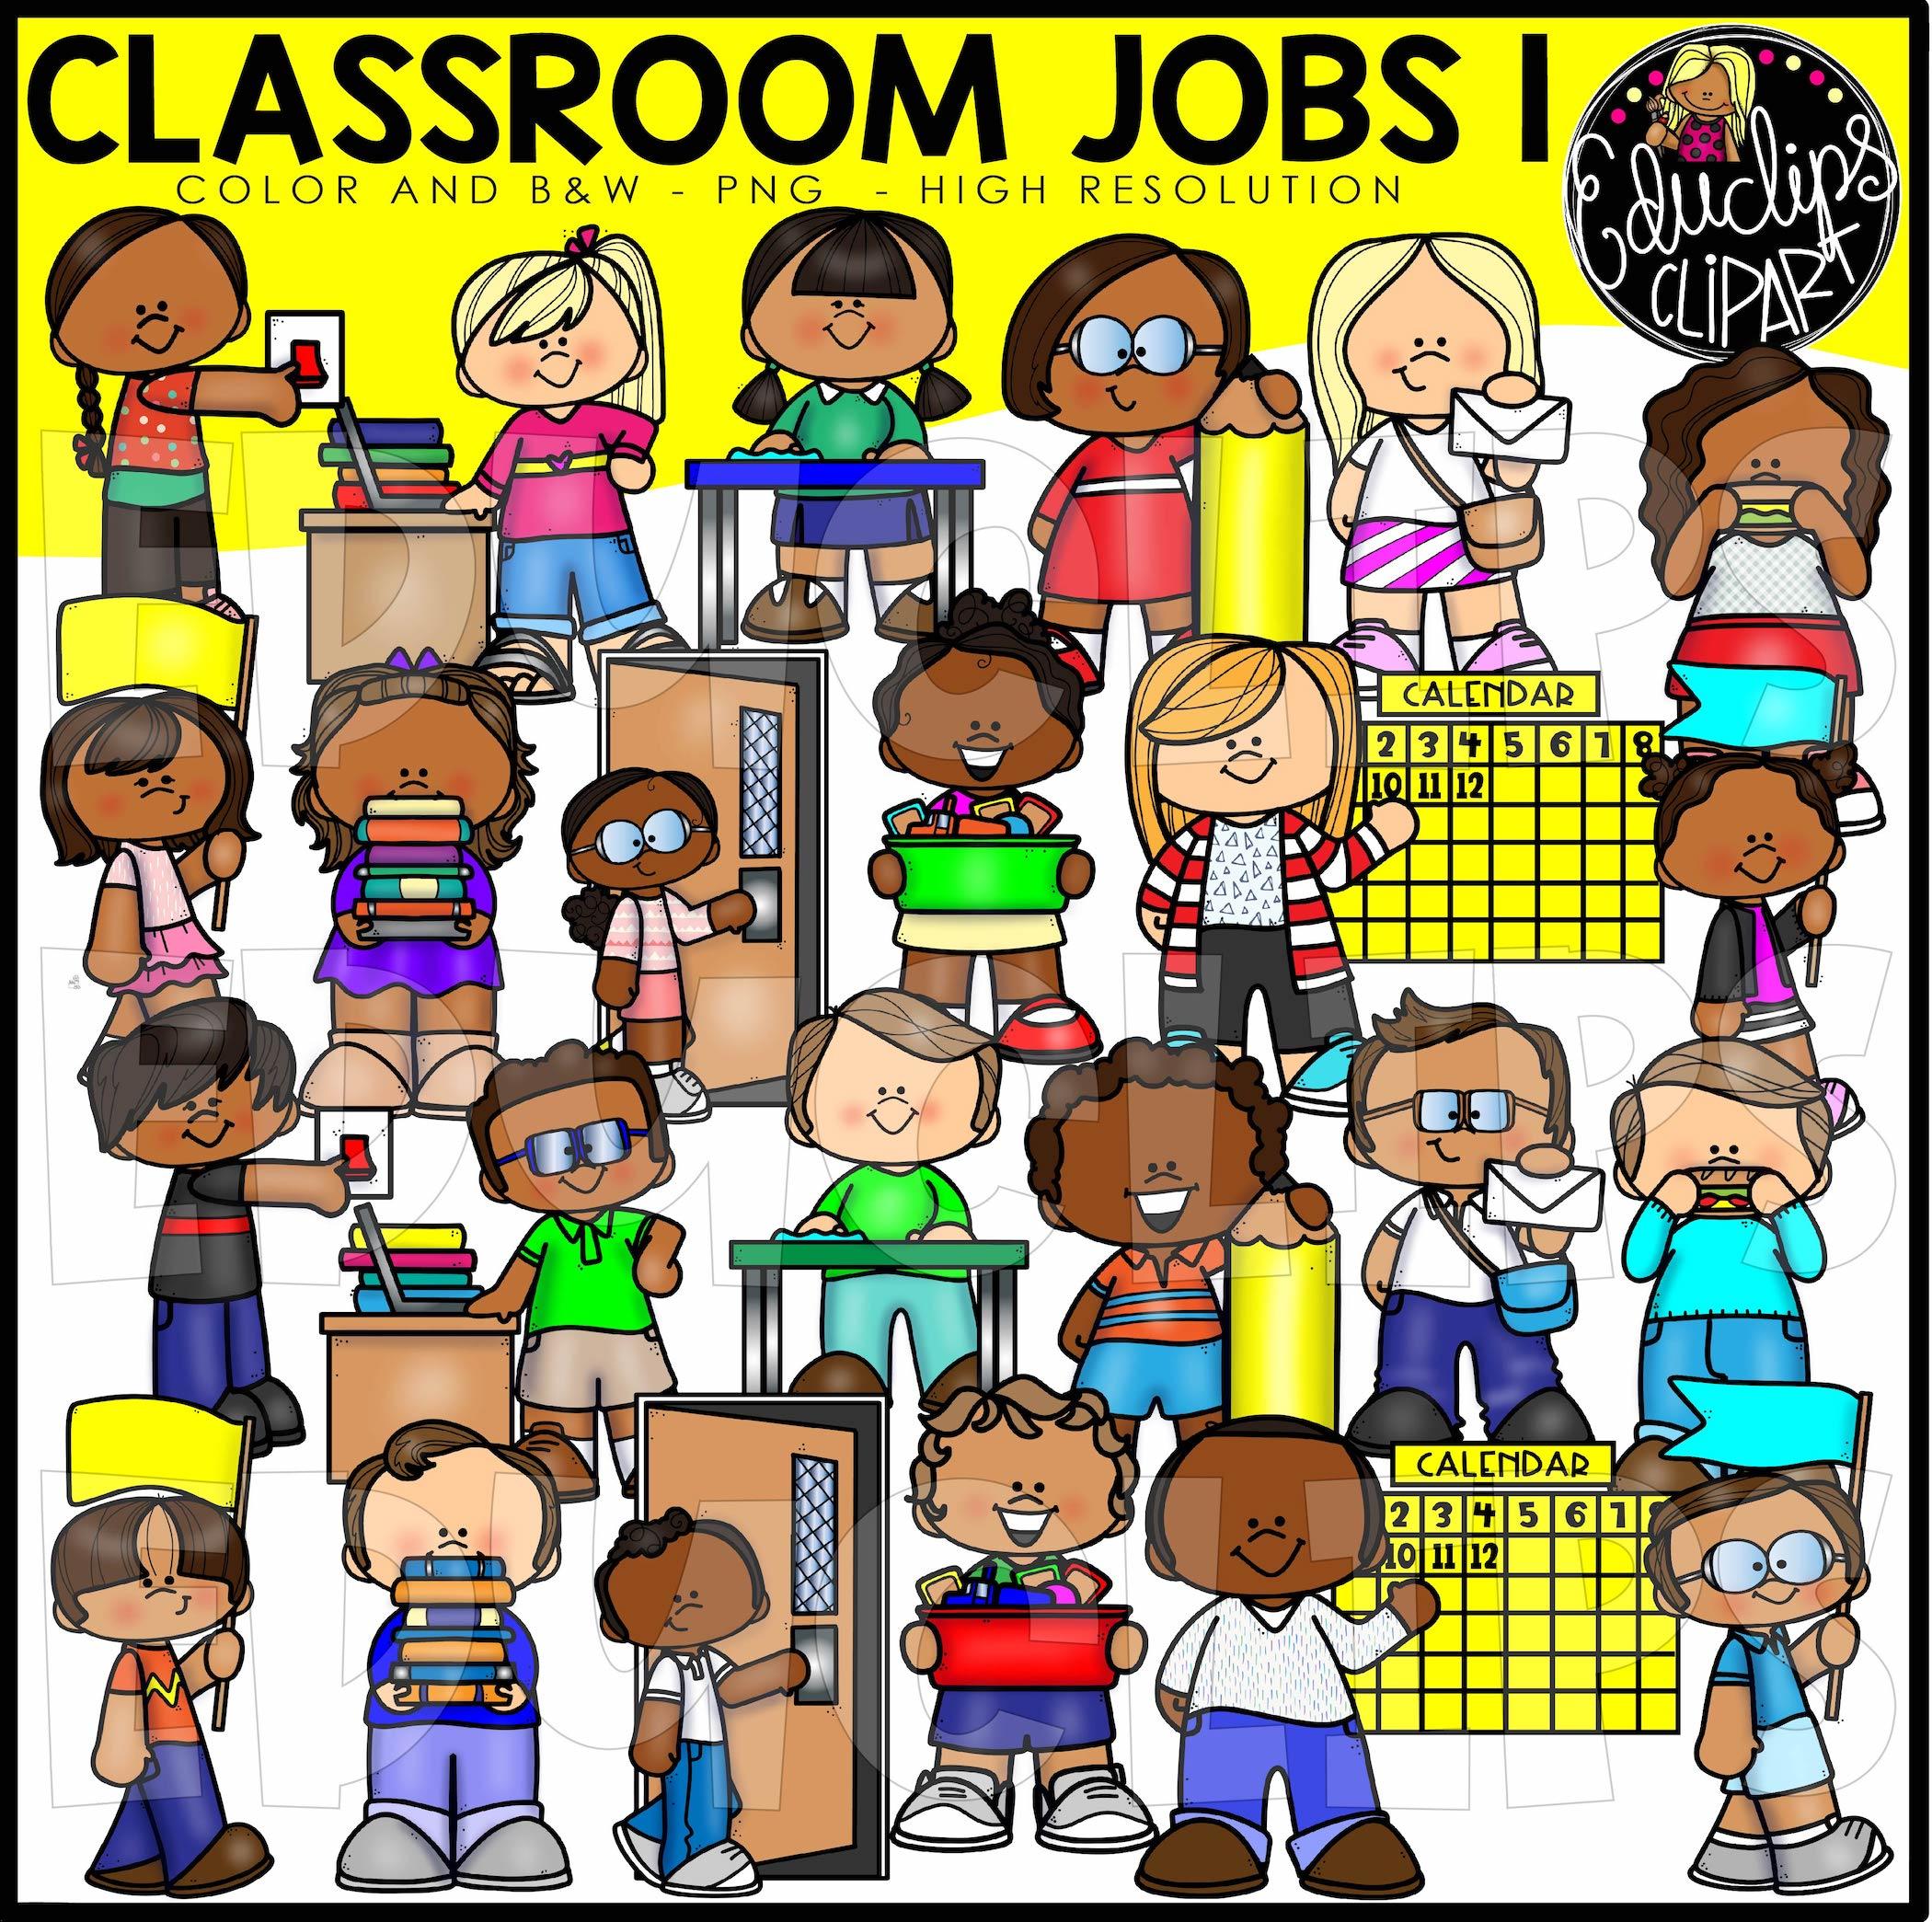 Table wiper job clipart png free Classroom Jobs 1 Clip Art Bundle (Color and B&W) png free